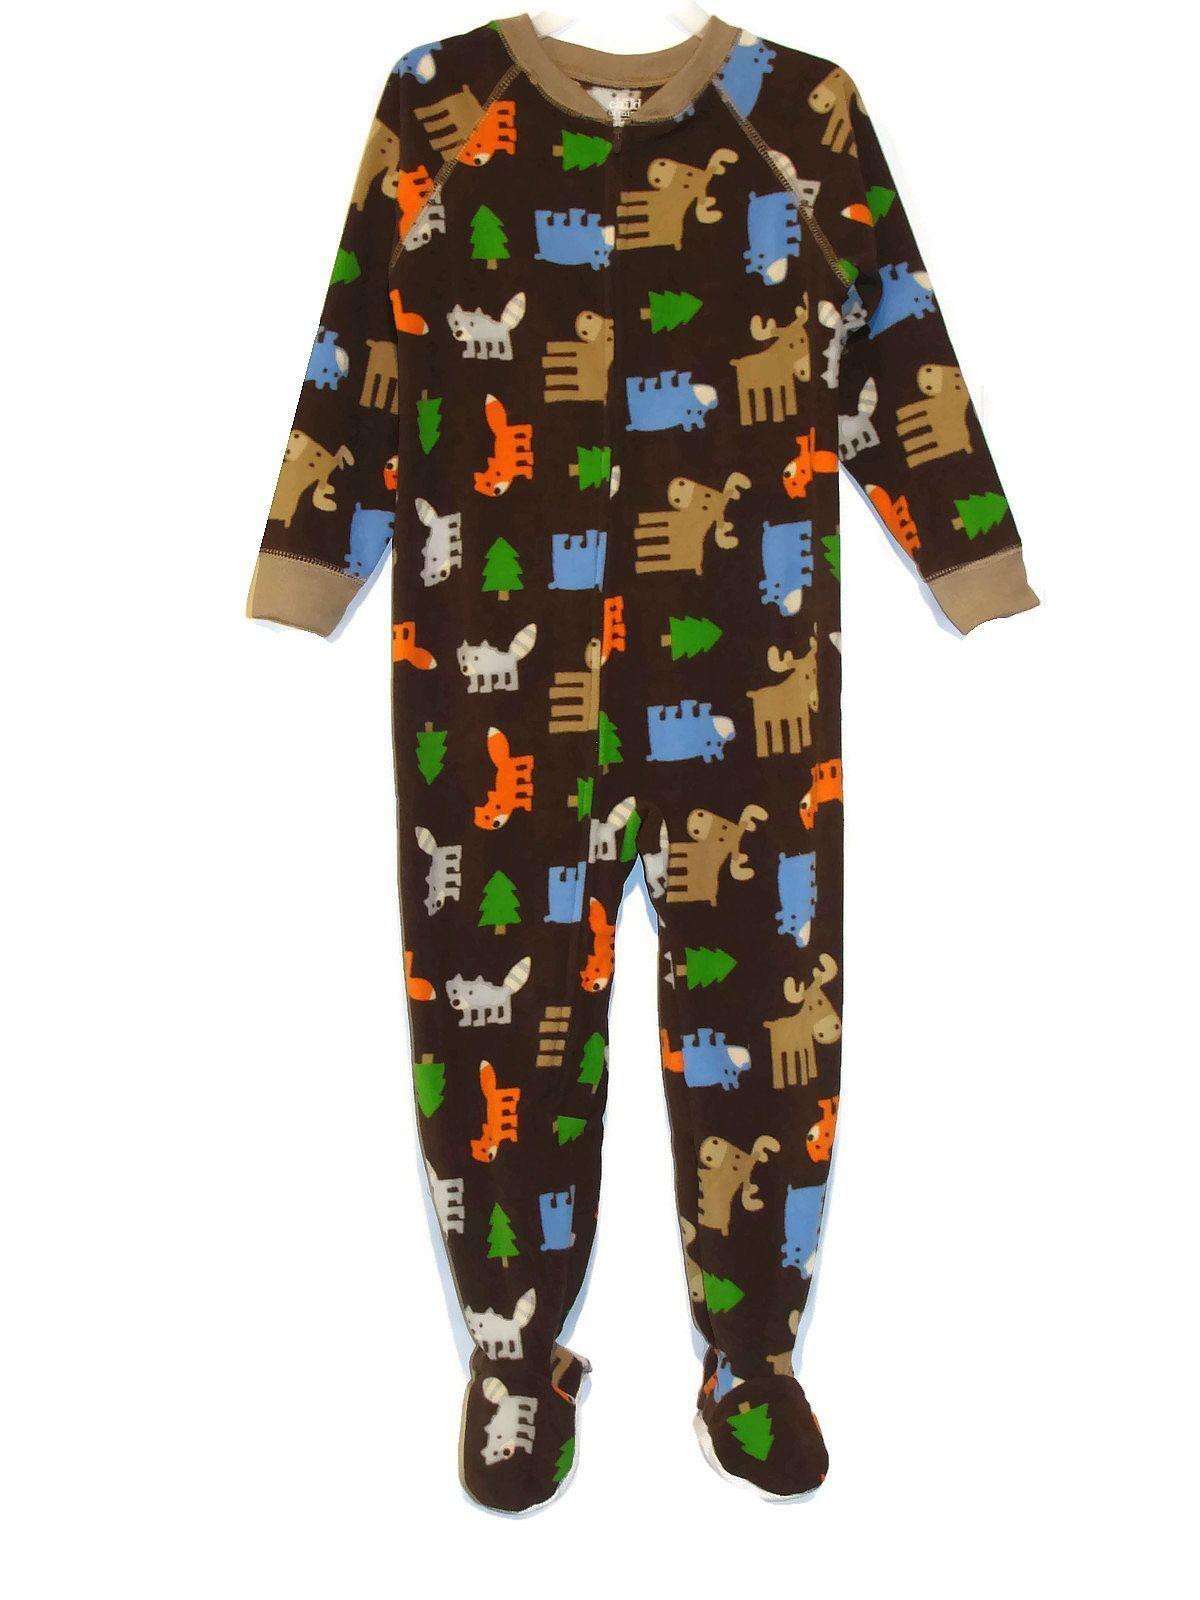 NWT Carters Husky Dog Forest Animals Toddler Boys Footed Fleece Sleeper Pajamas